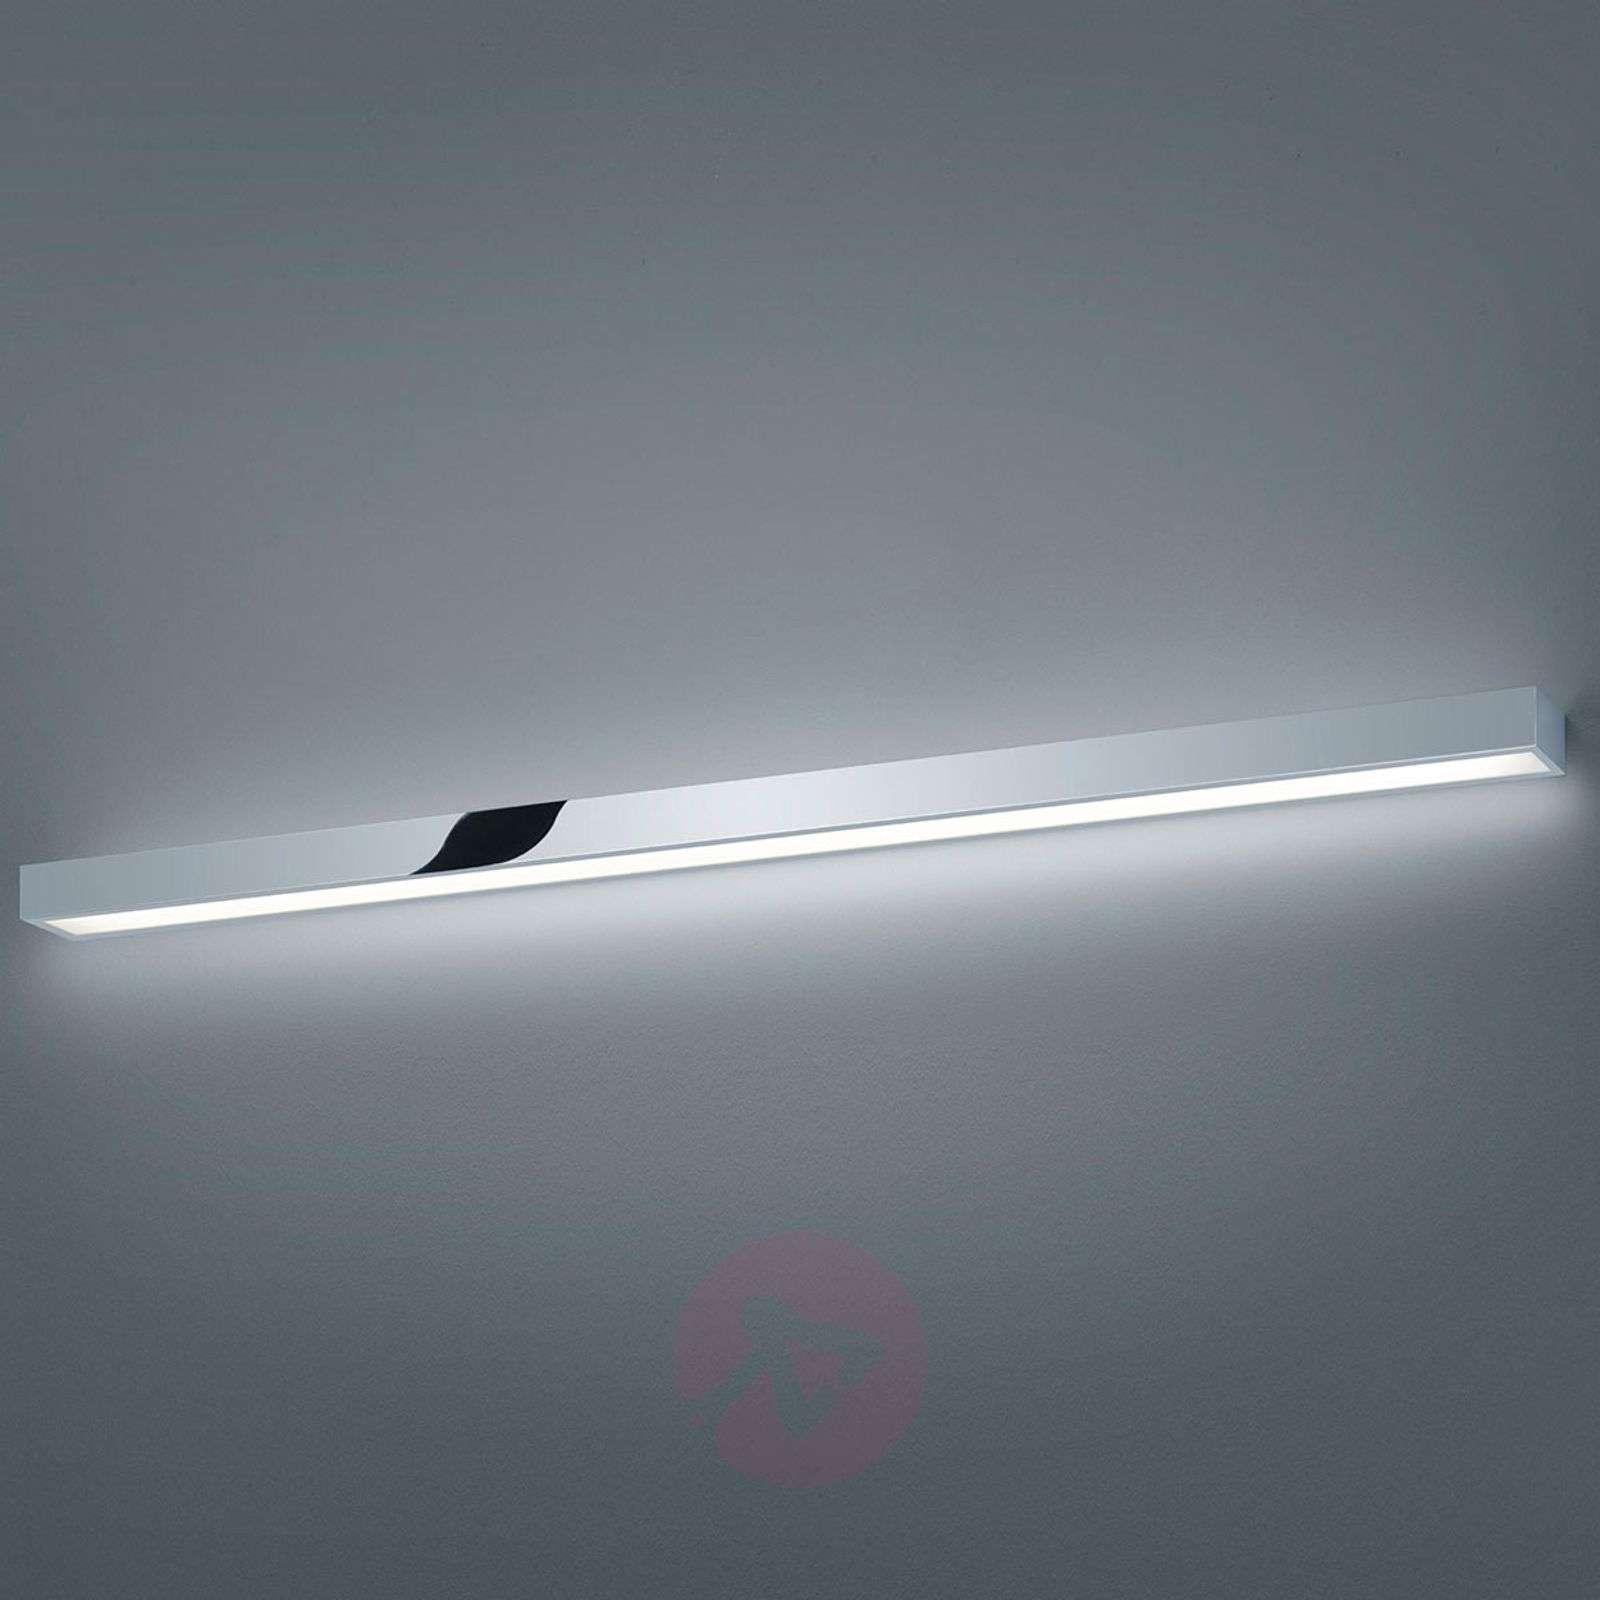 Helestra Theia LED mirror light, 120 cm-4516448-02